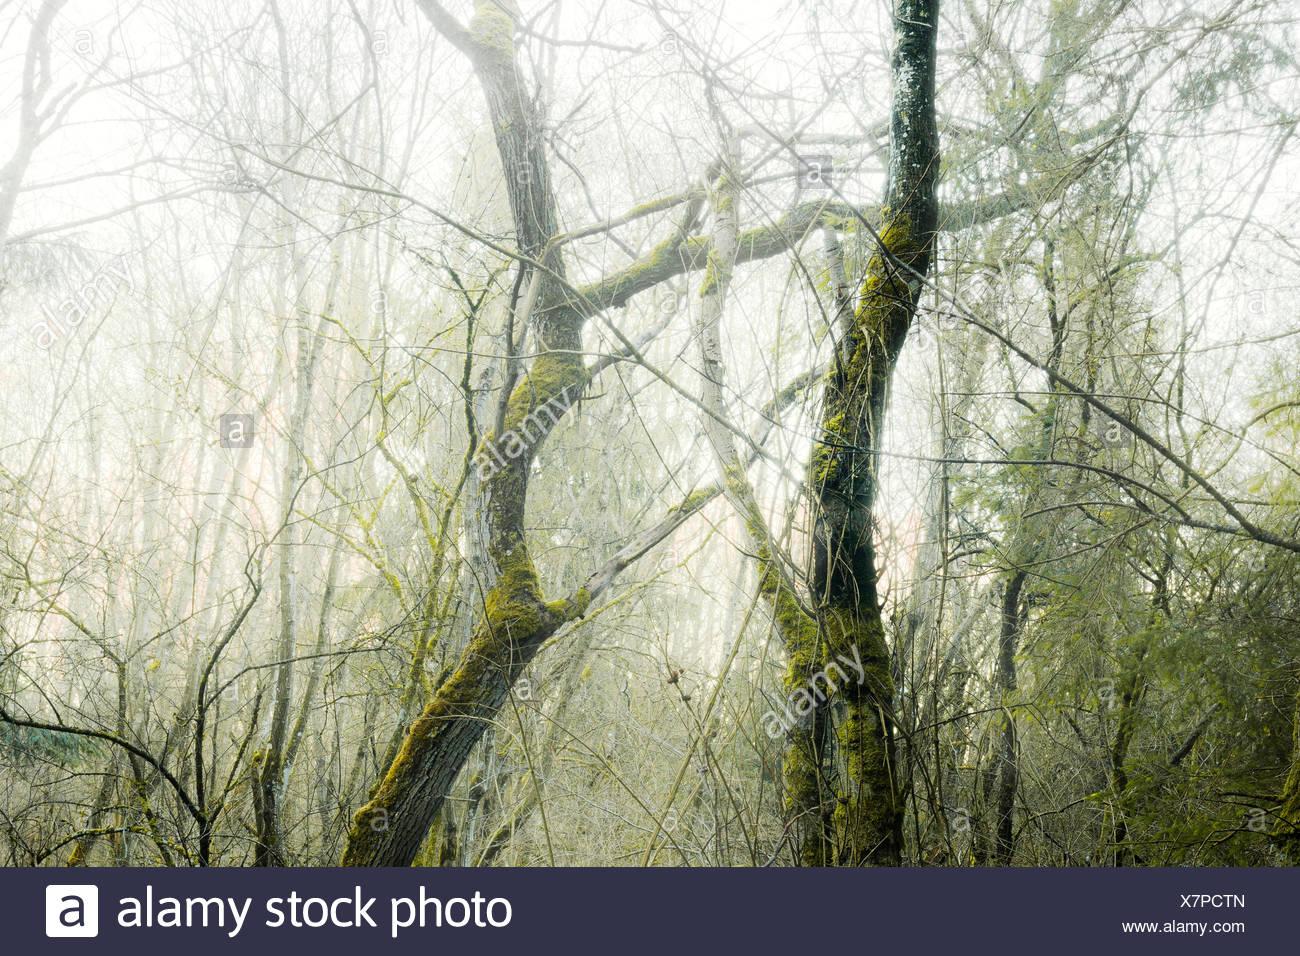 Wood, tree, moss, mystical, gloomy, green, morning, fog, old, creating, Germany, Bavaria - Stock Image